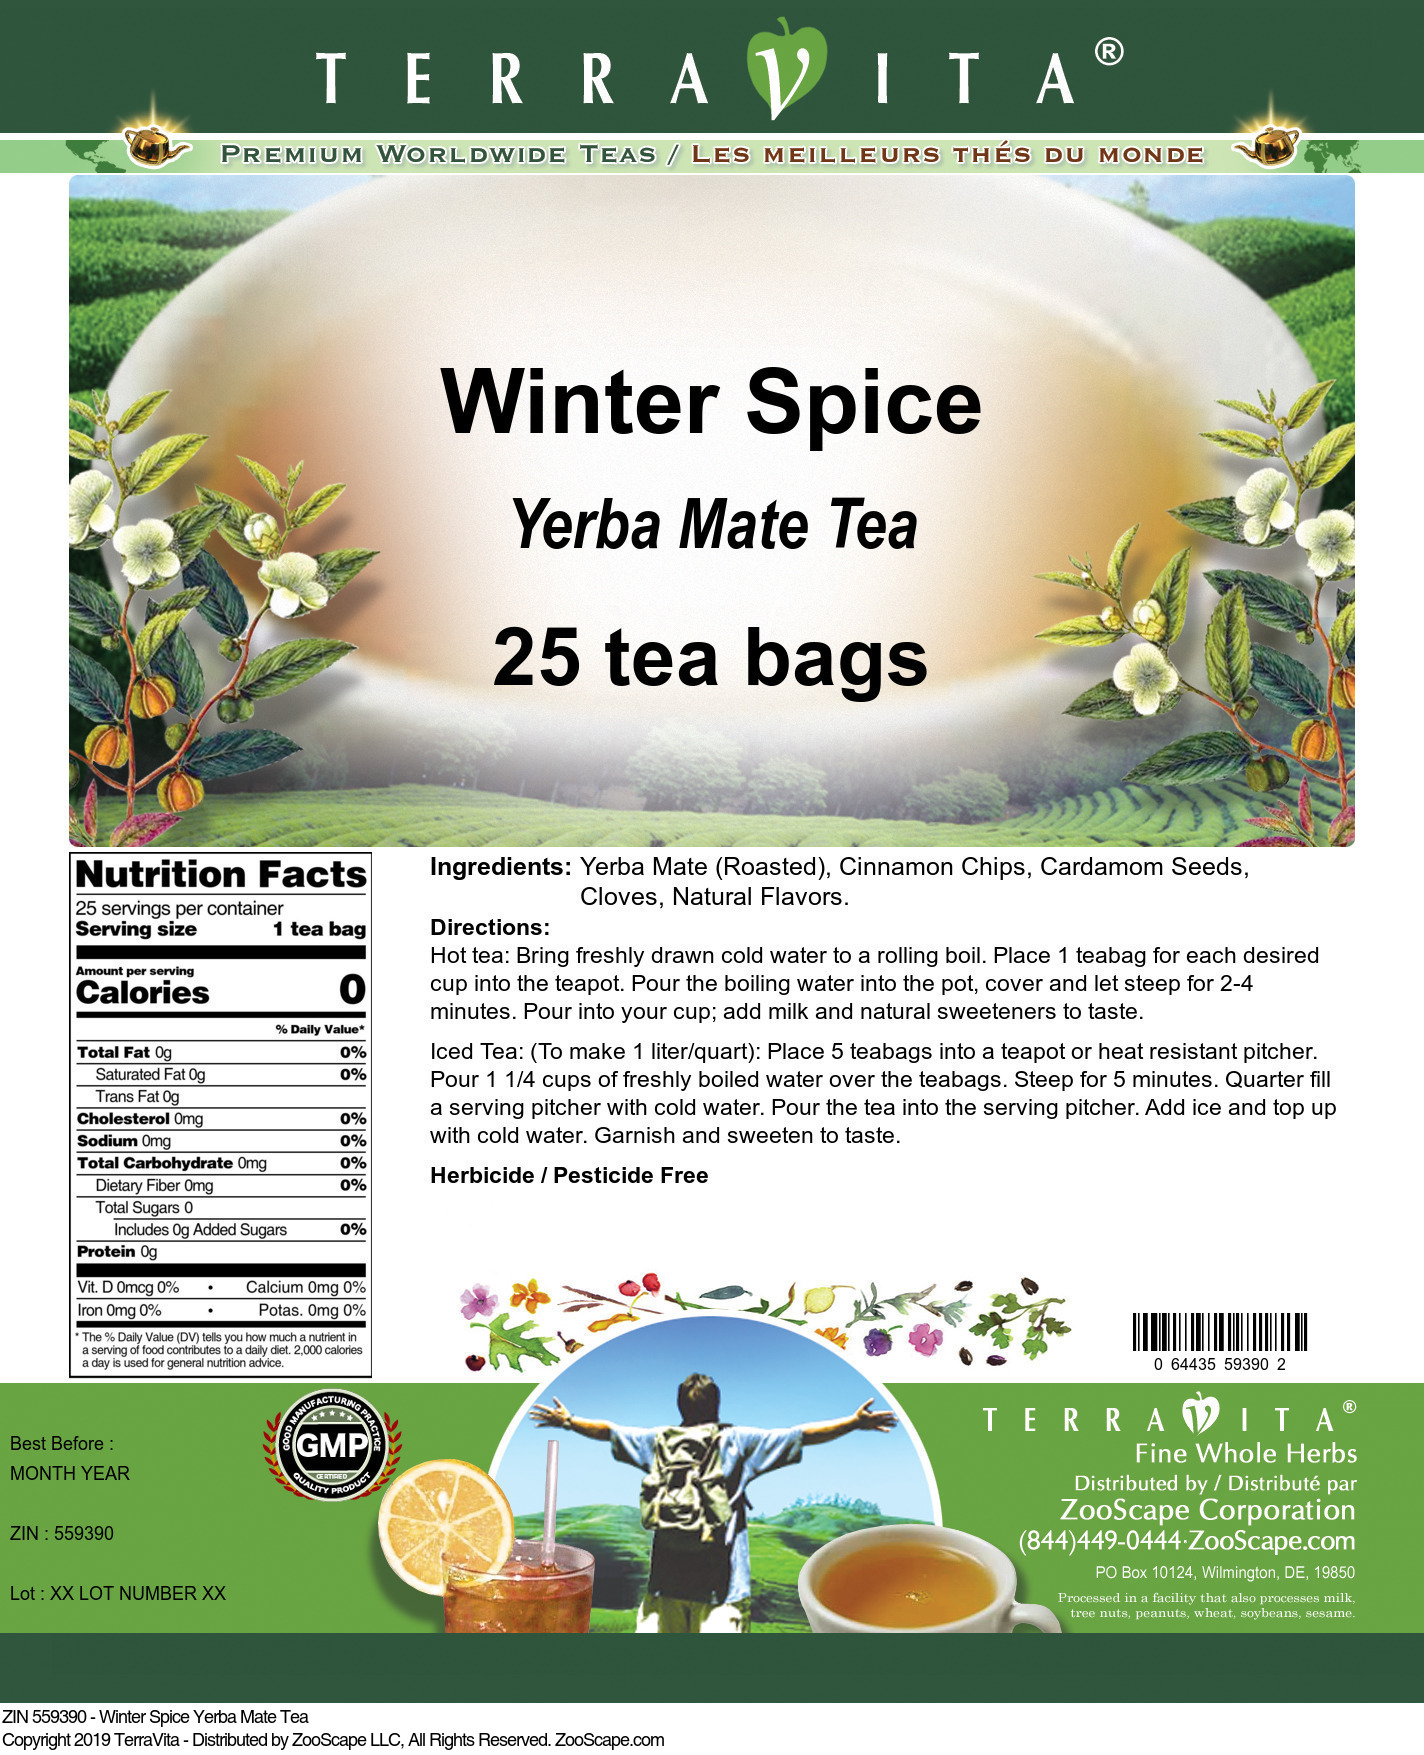 Winter Spice Yerba Mate